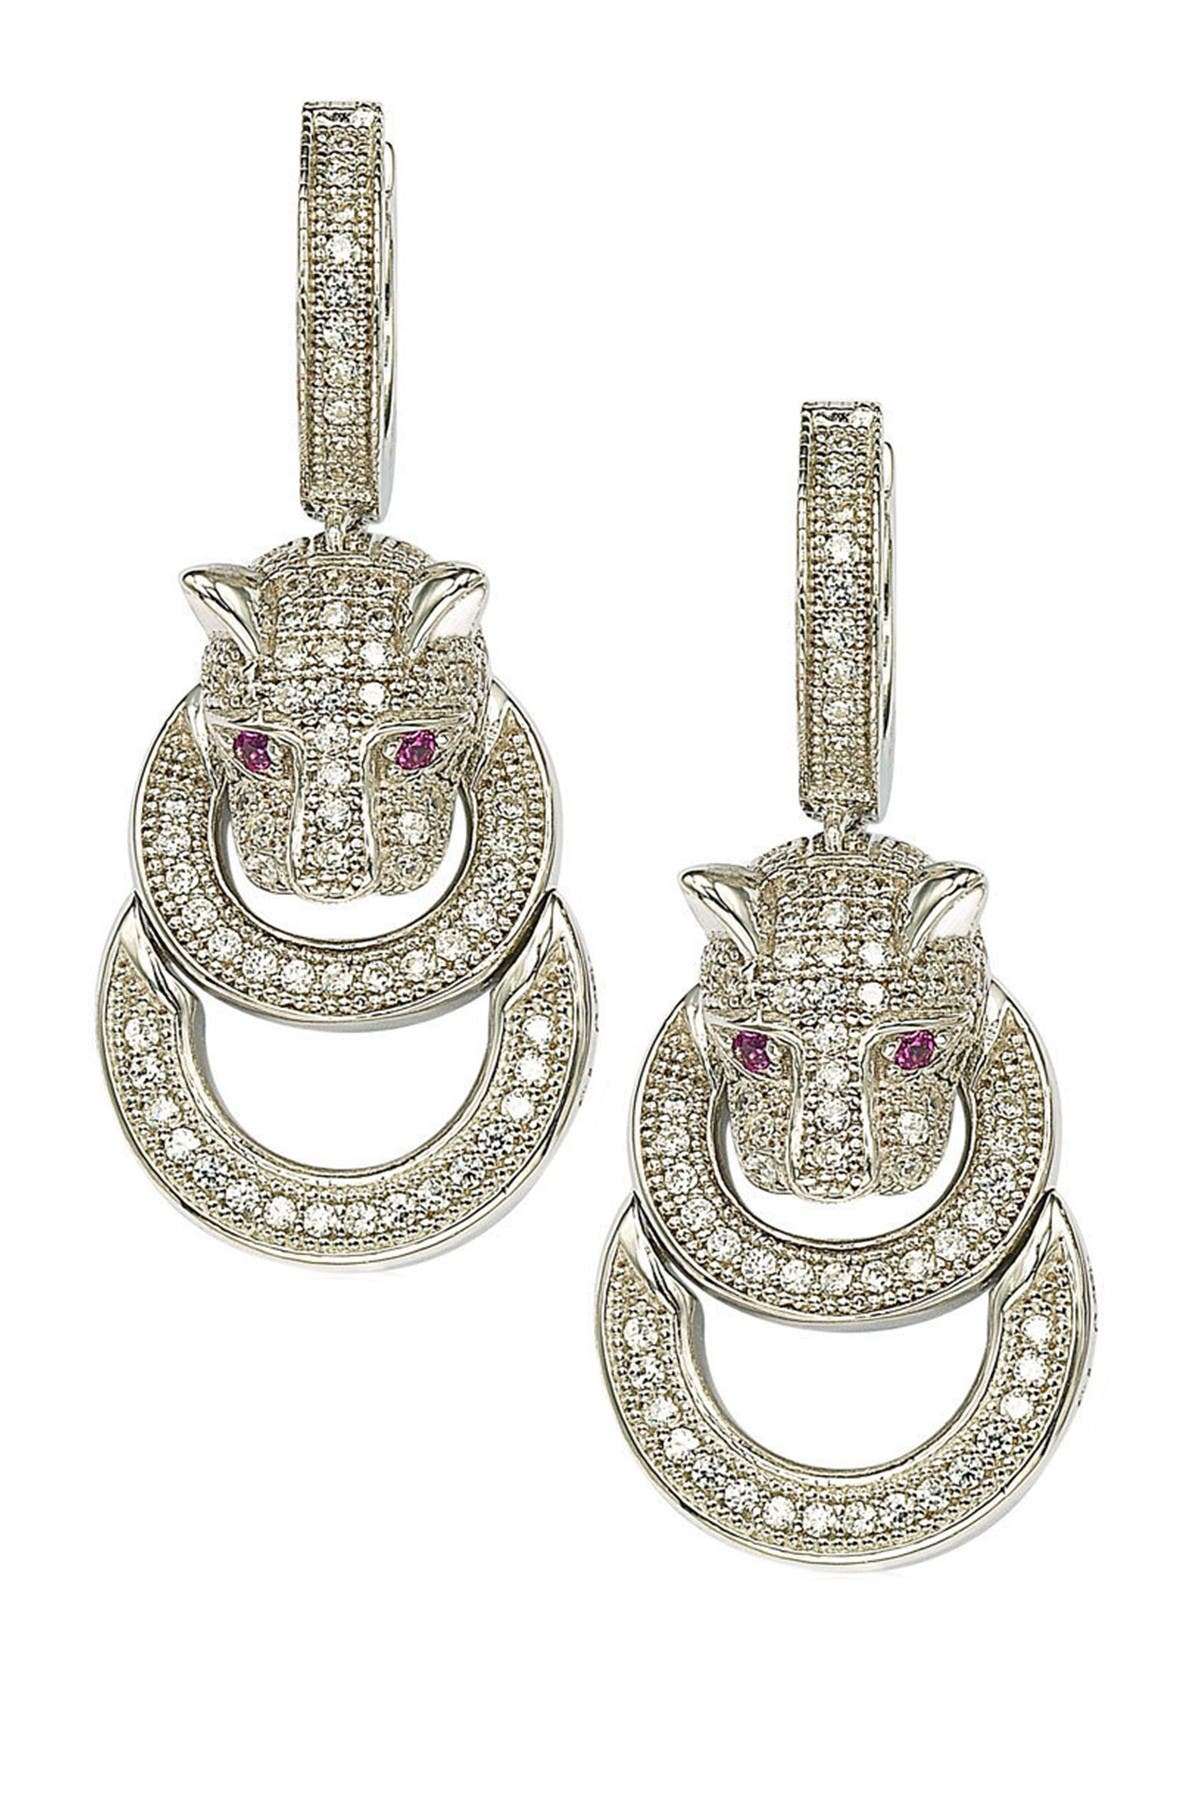 Image of Suzy Levian Sterling Silver CZ Jaguar Earrings